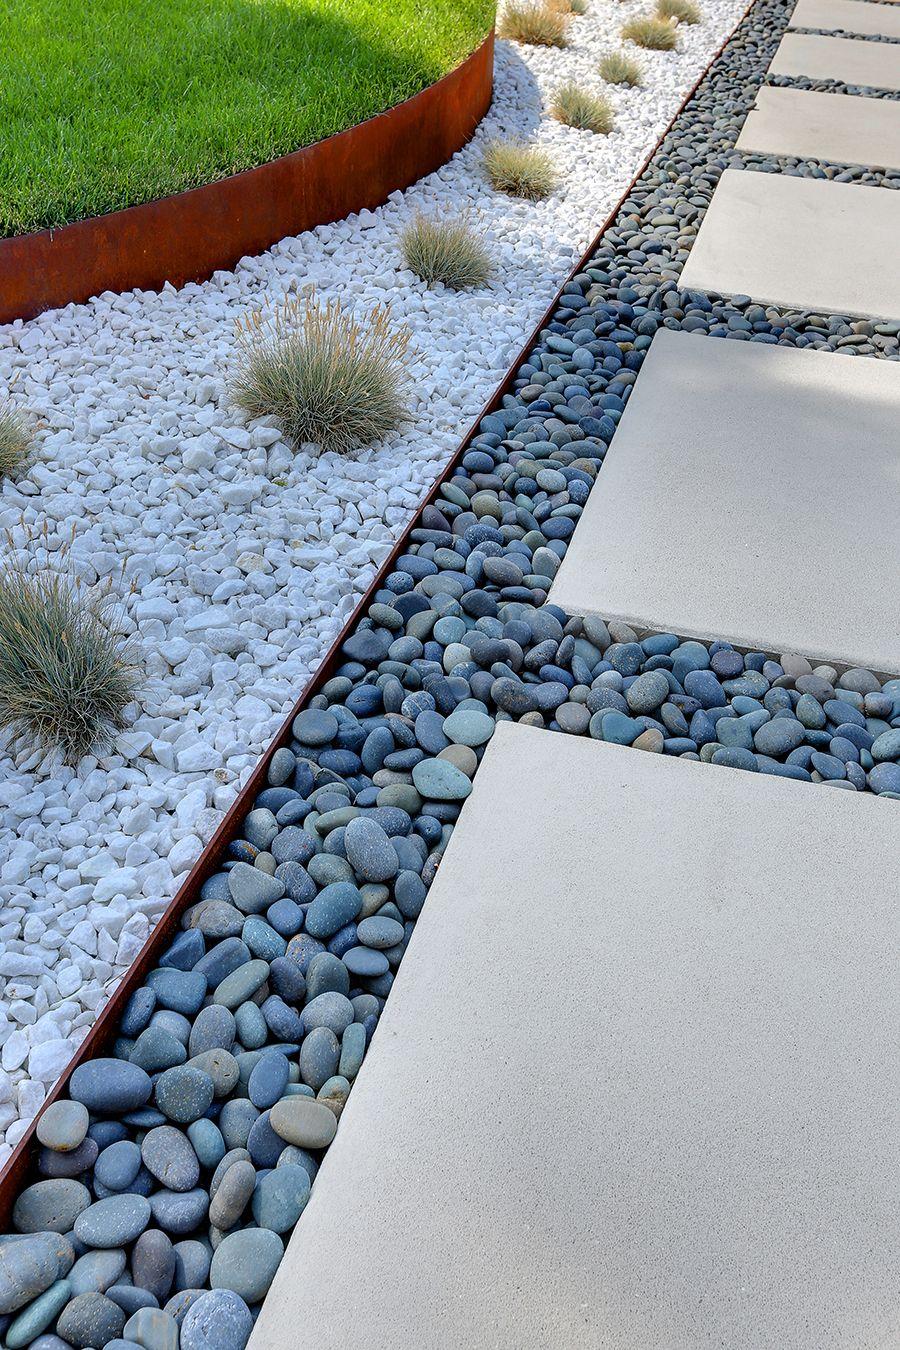 37 Garden Border Ideas To Dress Up Your Landscape Edging | Landscape ...